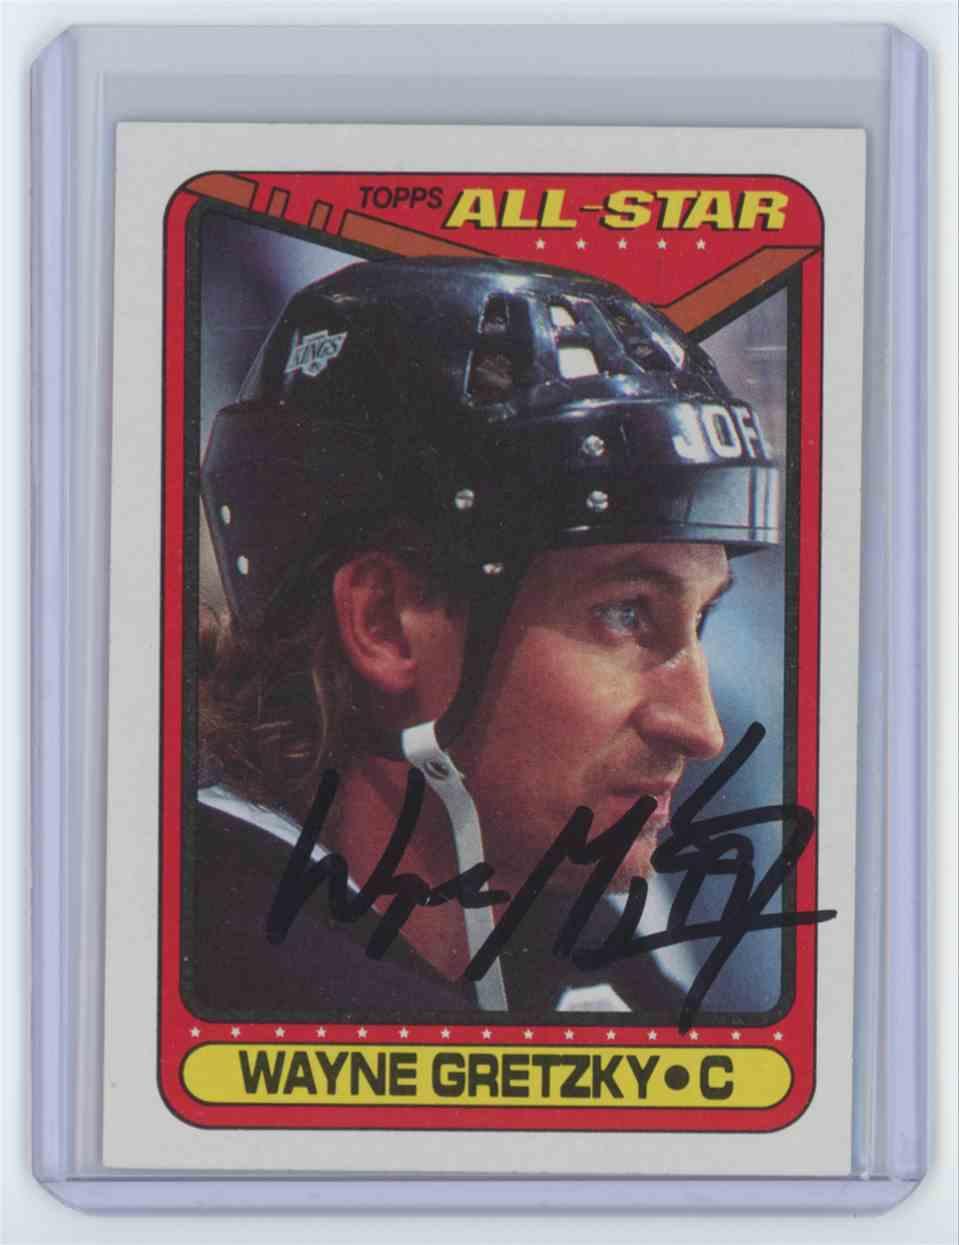 1990 1990-91 Topps All Star #199 Wayne Gretzky Los Angeles Kings Auto Wayne Gretzky #199 card front image